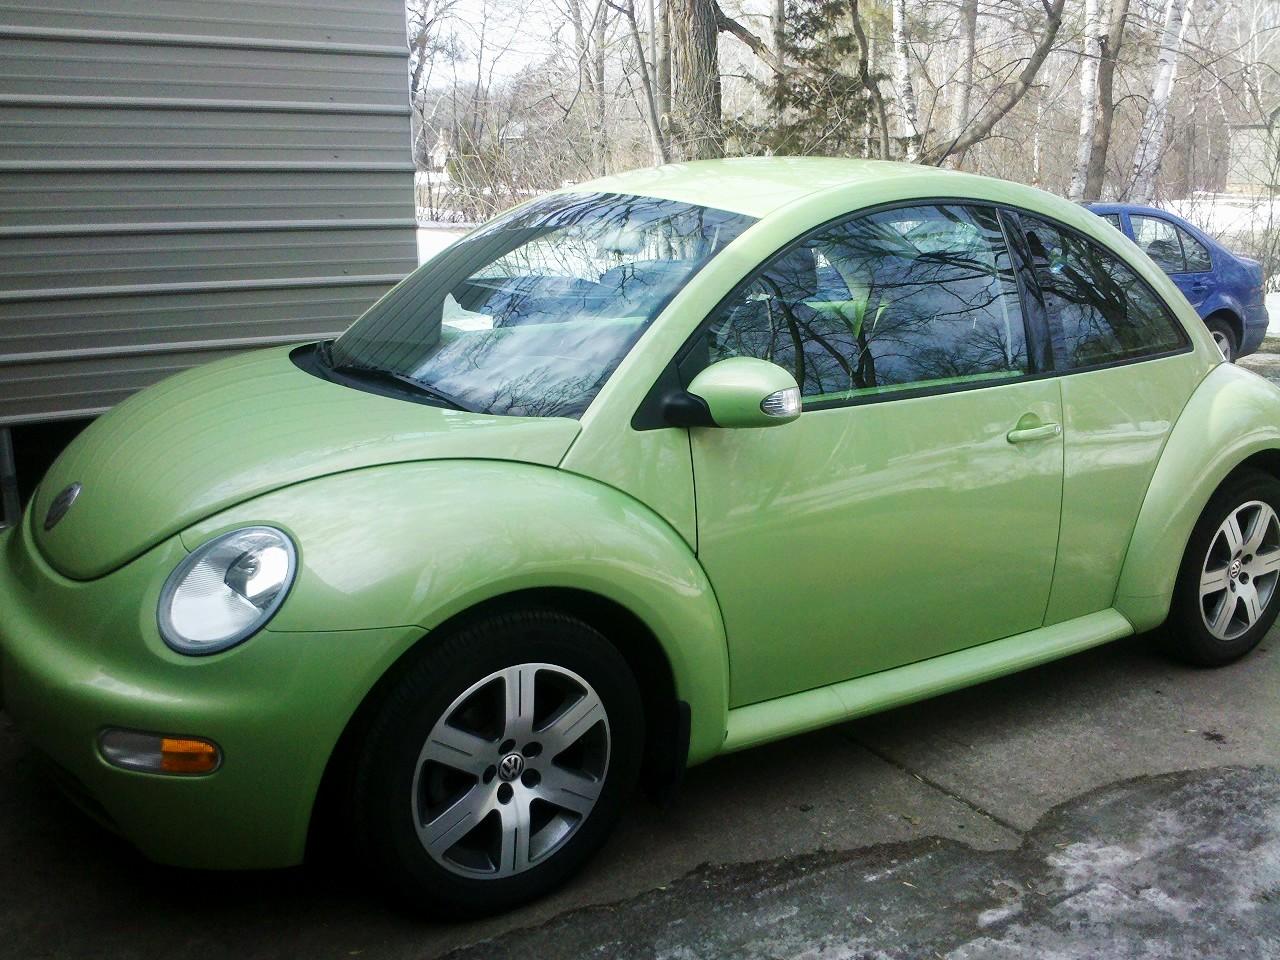 1000  images about Slugbug on Pinterest | Slug, Beetle and Gene ...